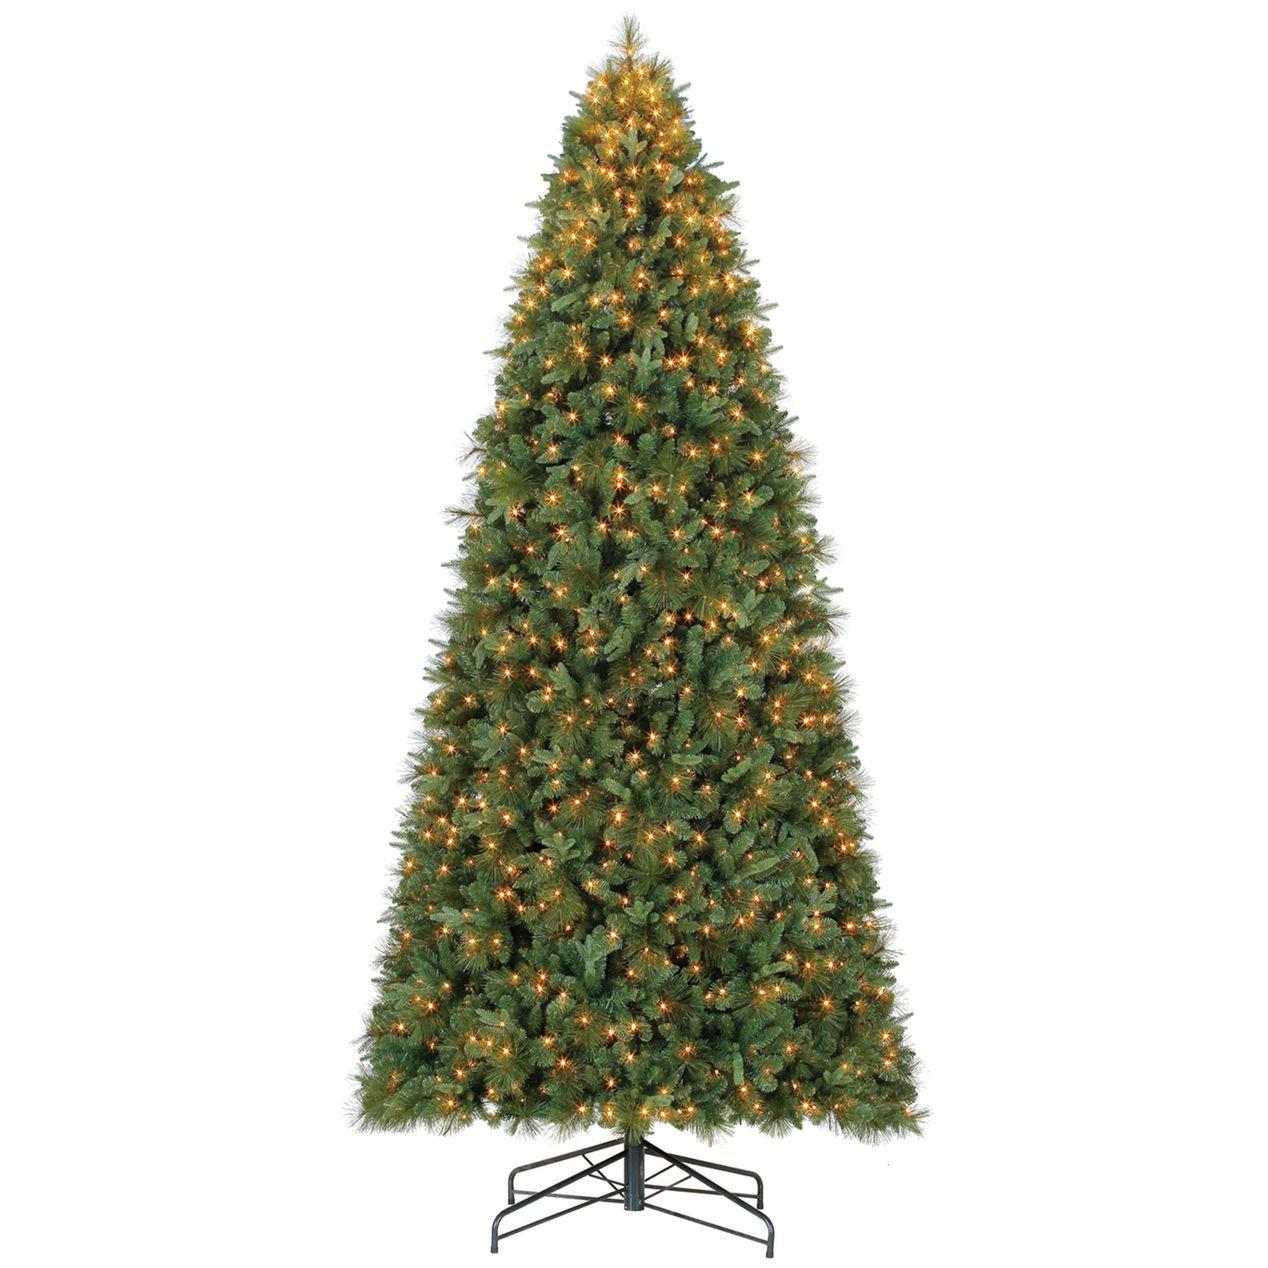 C31 12 Ft Pre Lit Aurora Mixed Needle Christmas Tree Pine Christmas Tree Christmas Tree Classic Christmas Tree